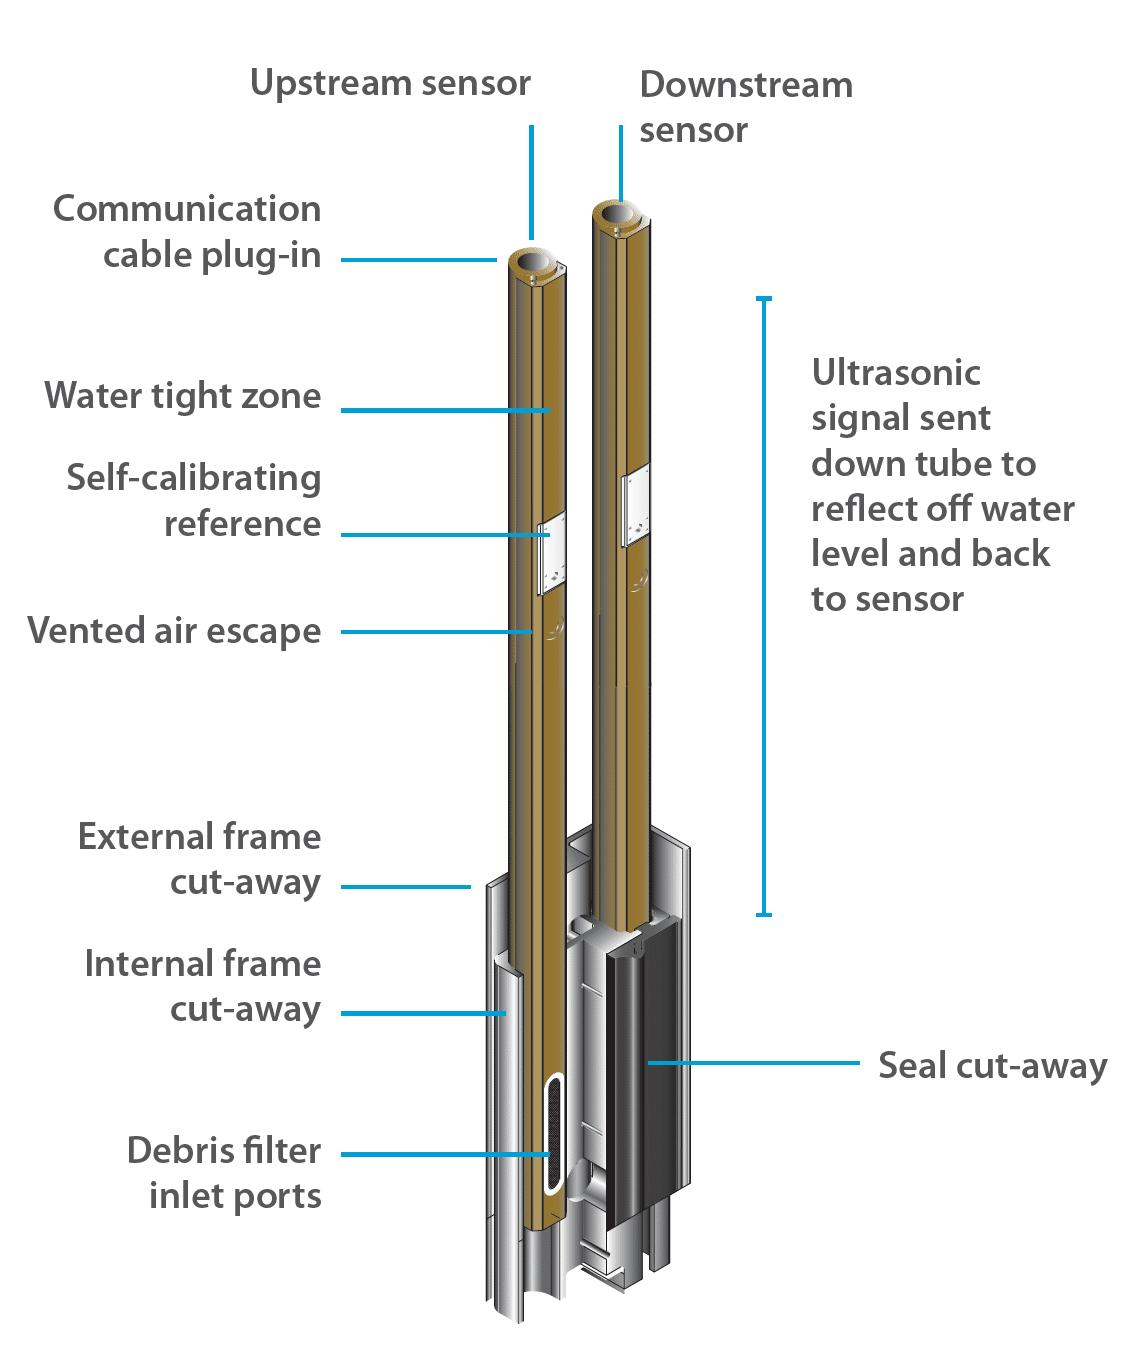 MicronLevel Ultrasonic Water Level Measurement Technology